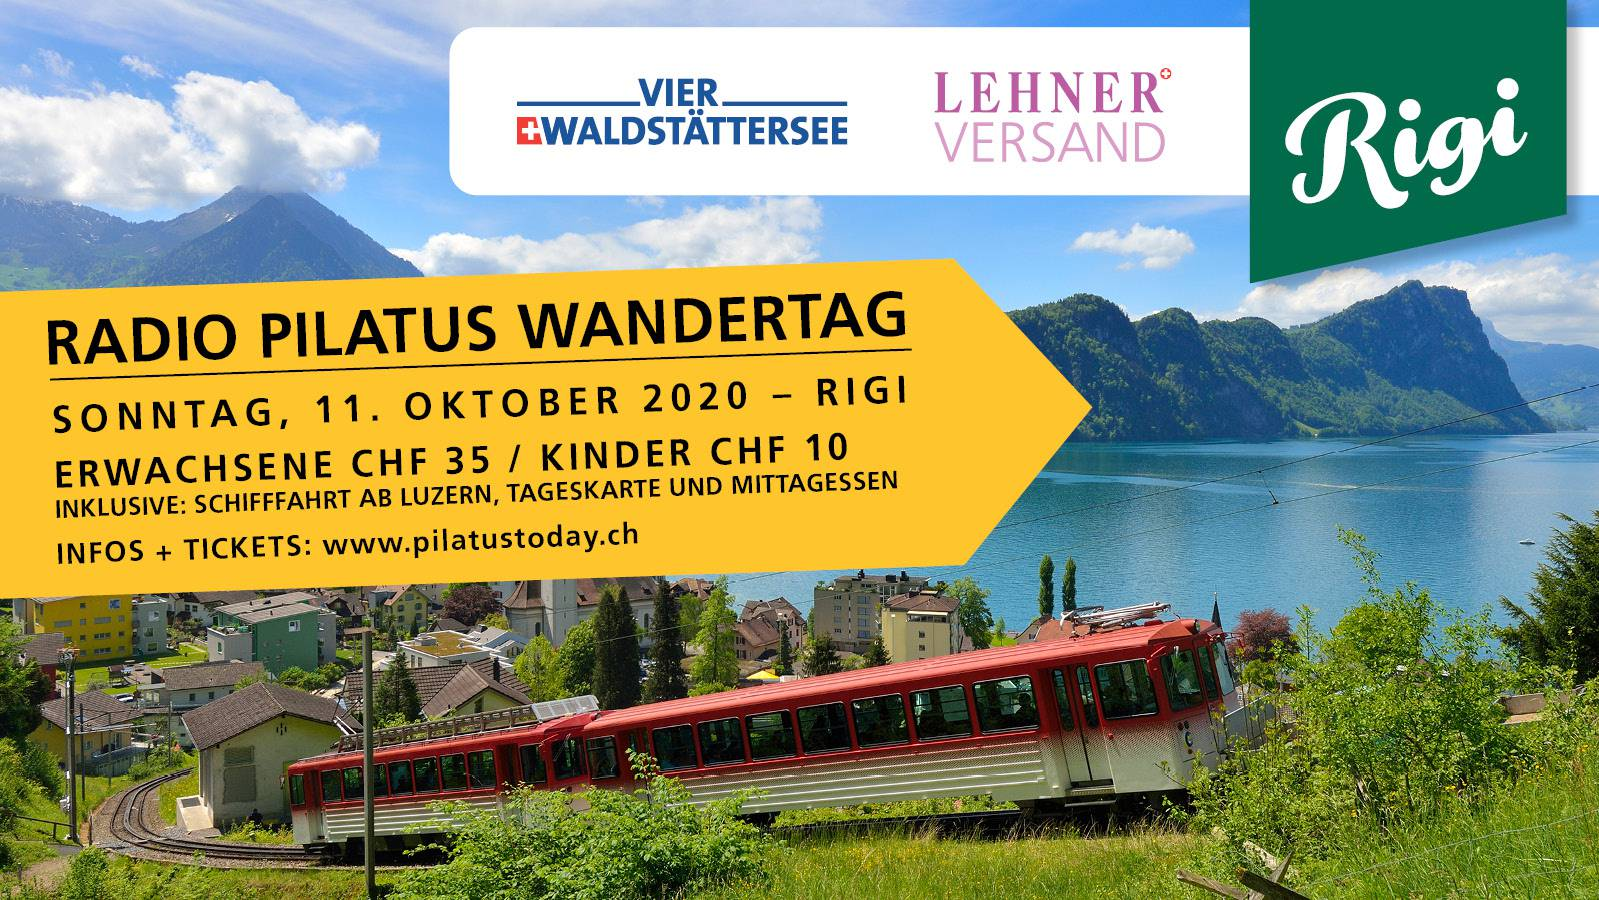 Radio Pilatus Wandertag